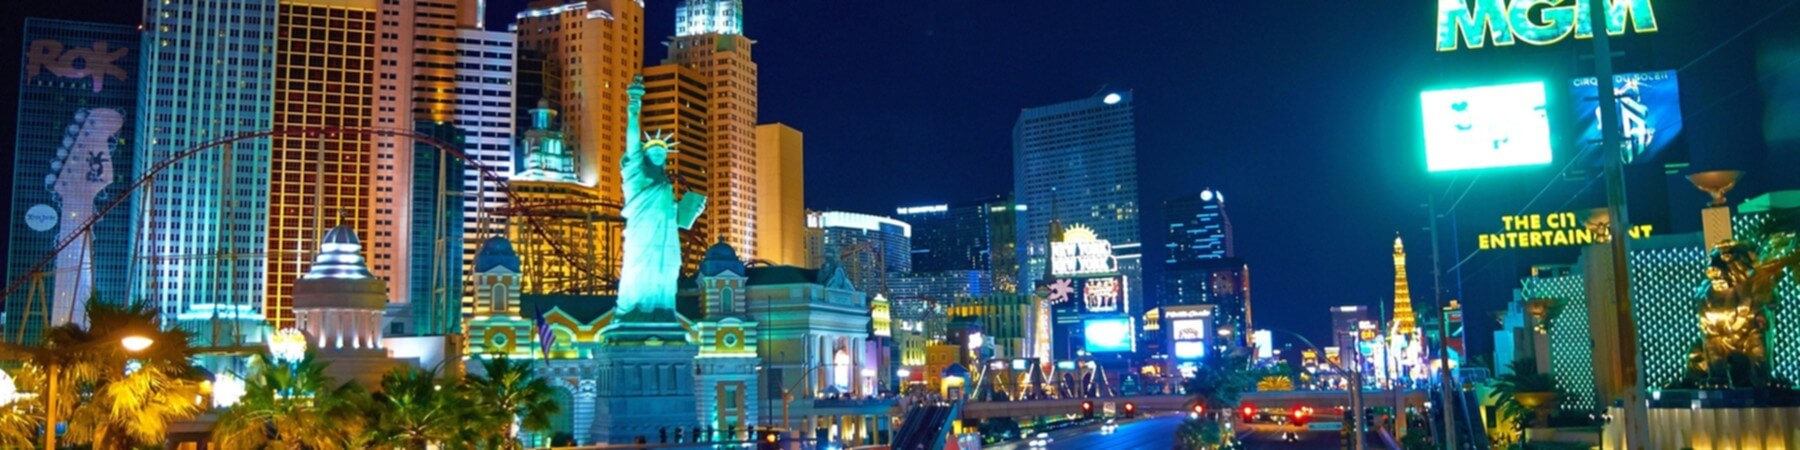 PrivateCarApp for party bus rental in Las Vegas